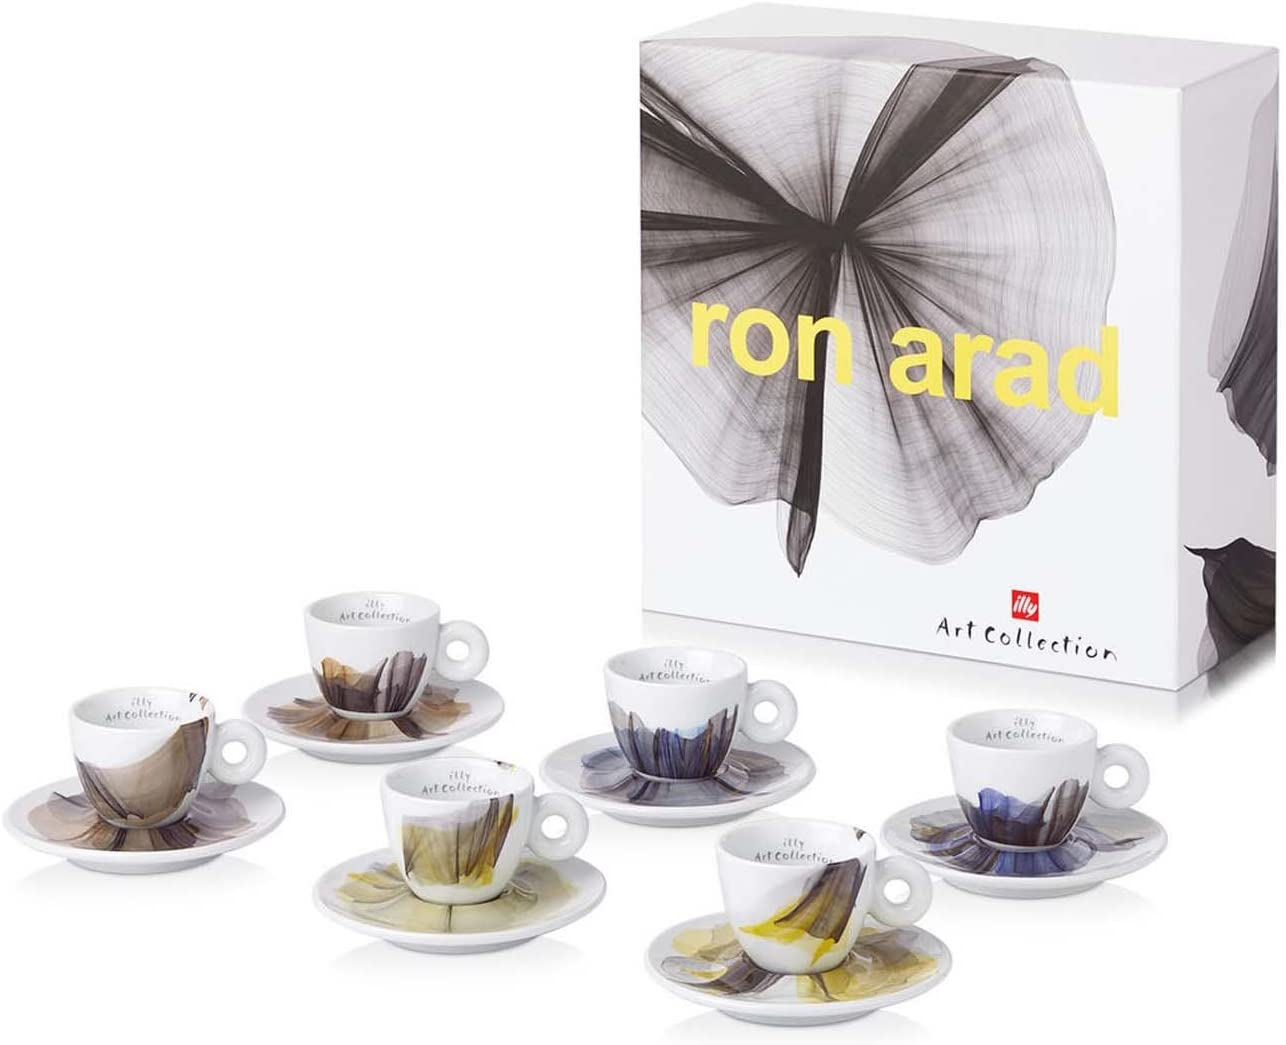 illy Ron Arad Espresso Art Collection - Juego de 6 tazas de café